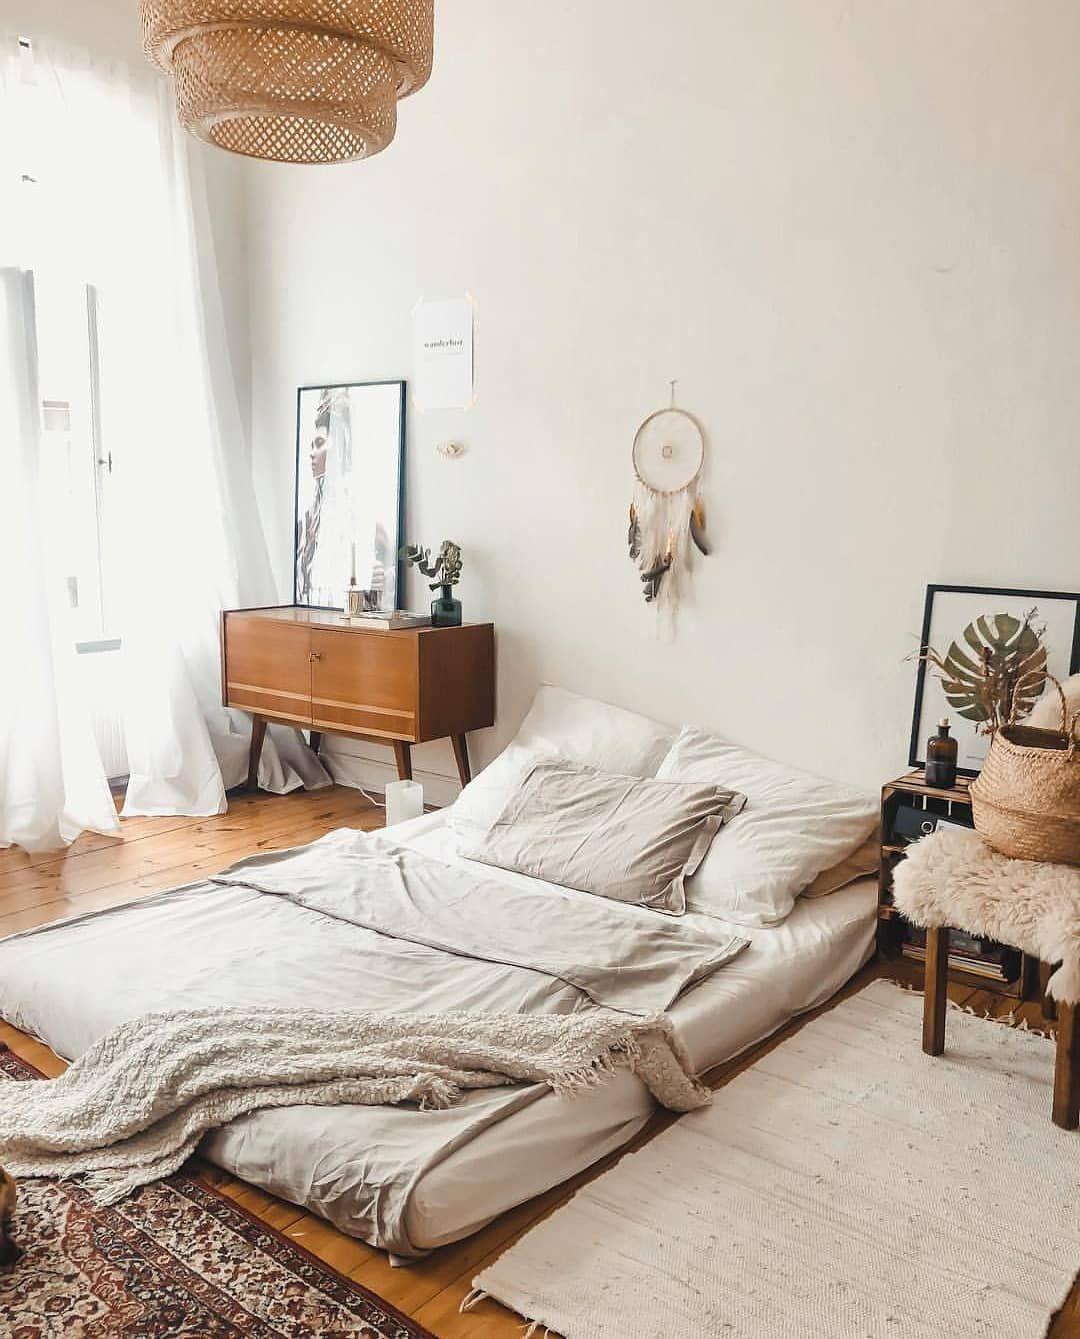 No Bed But Still Cozy Check Out Teesylvania Com To Get More